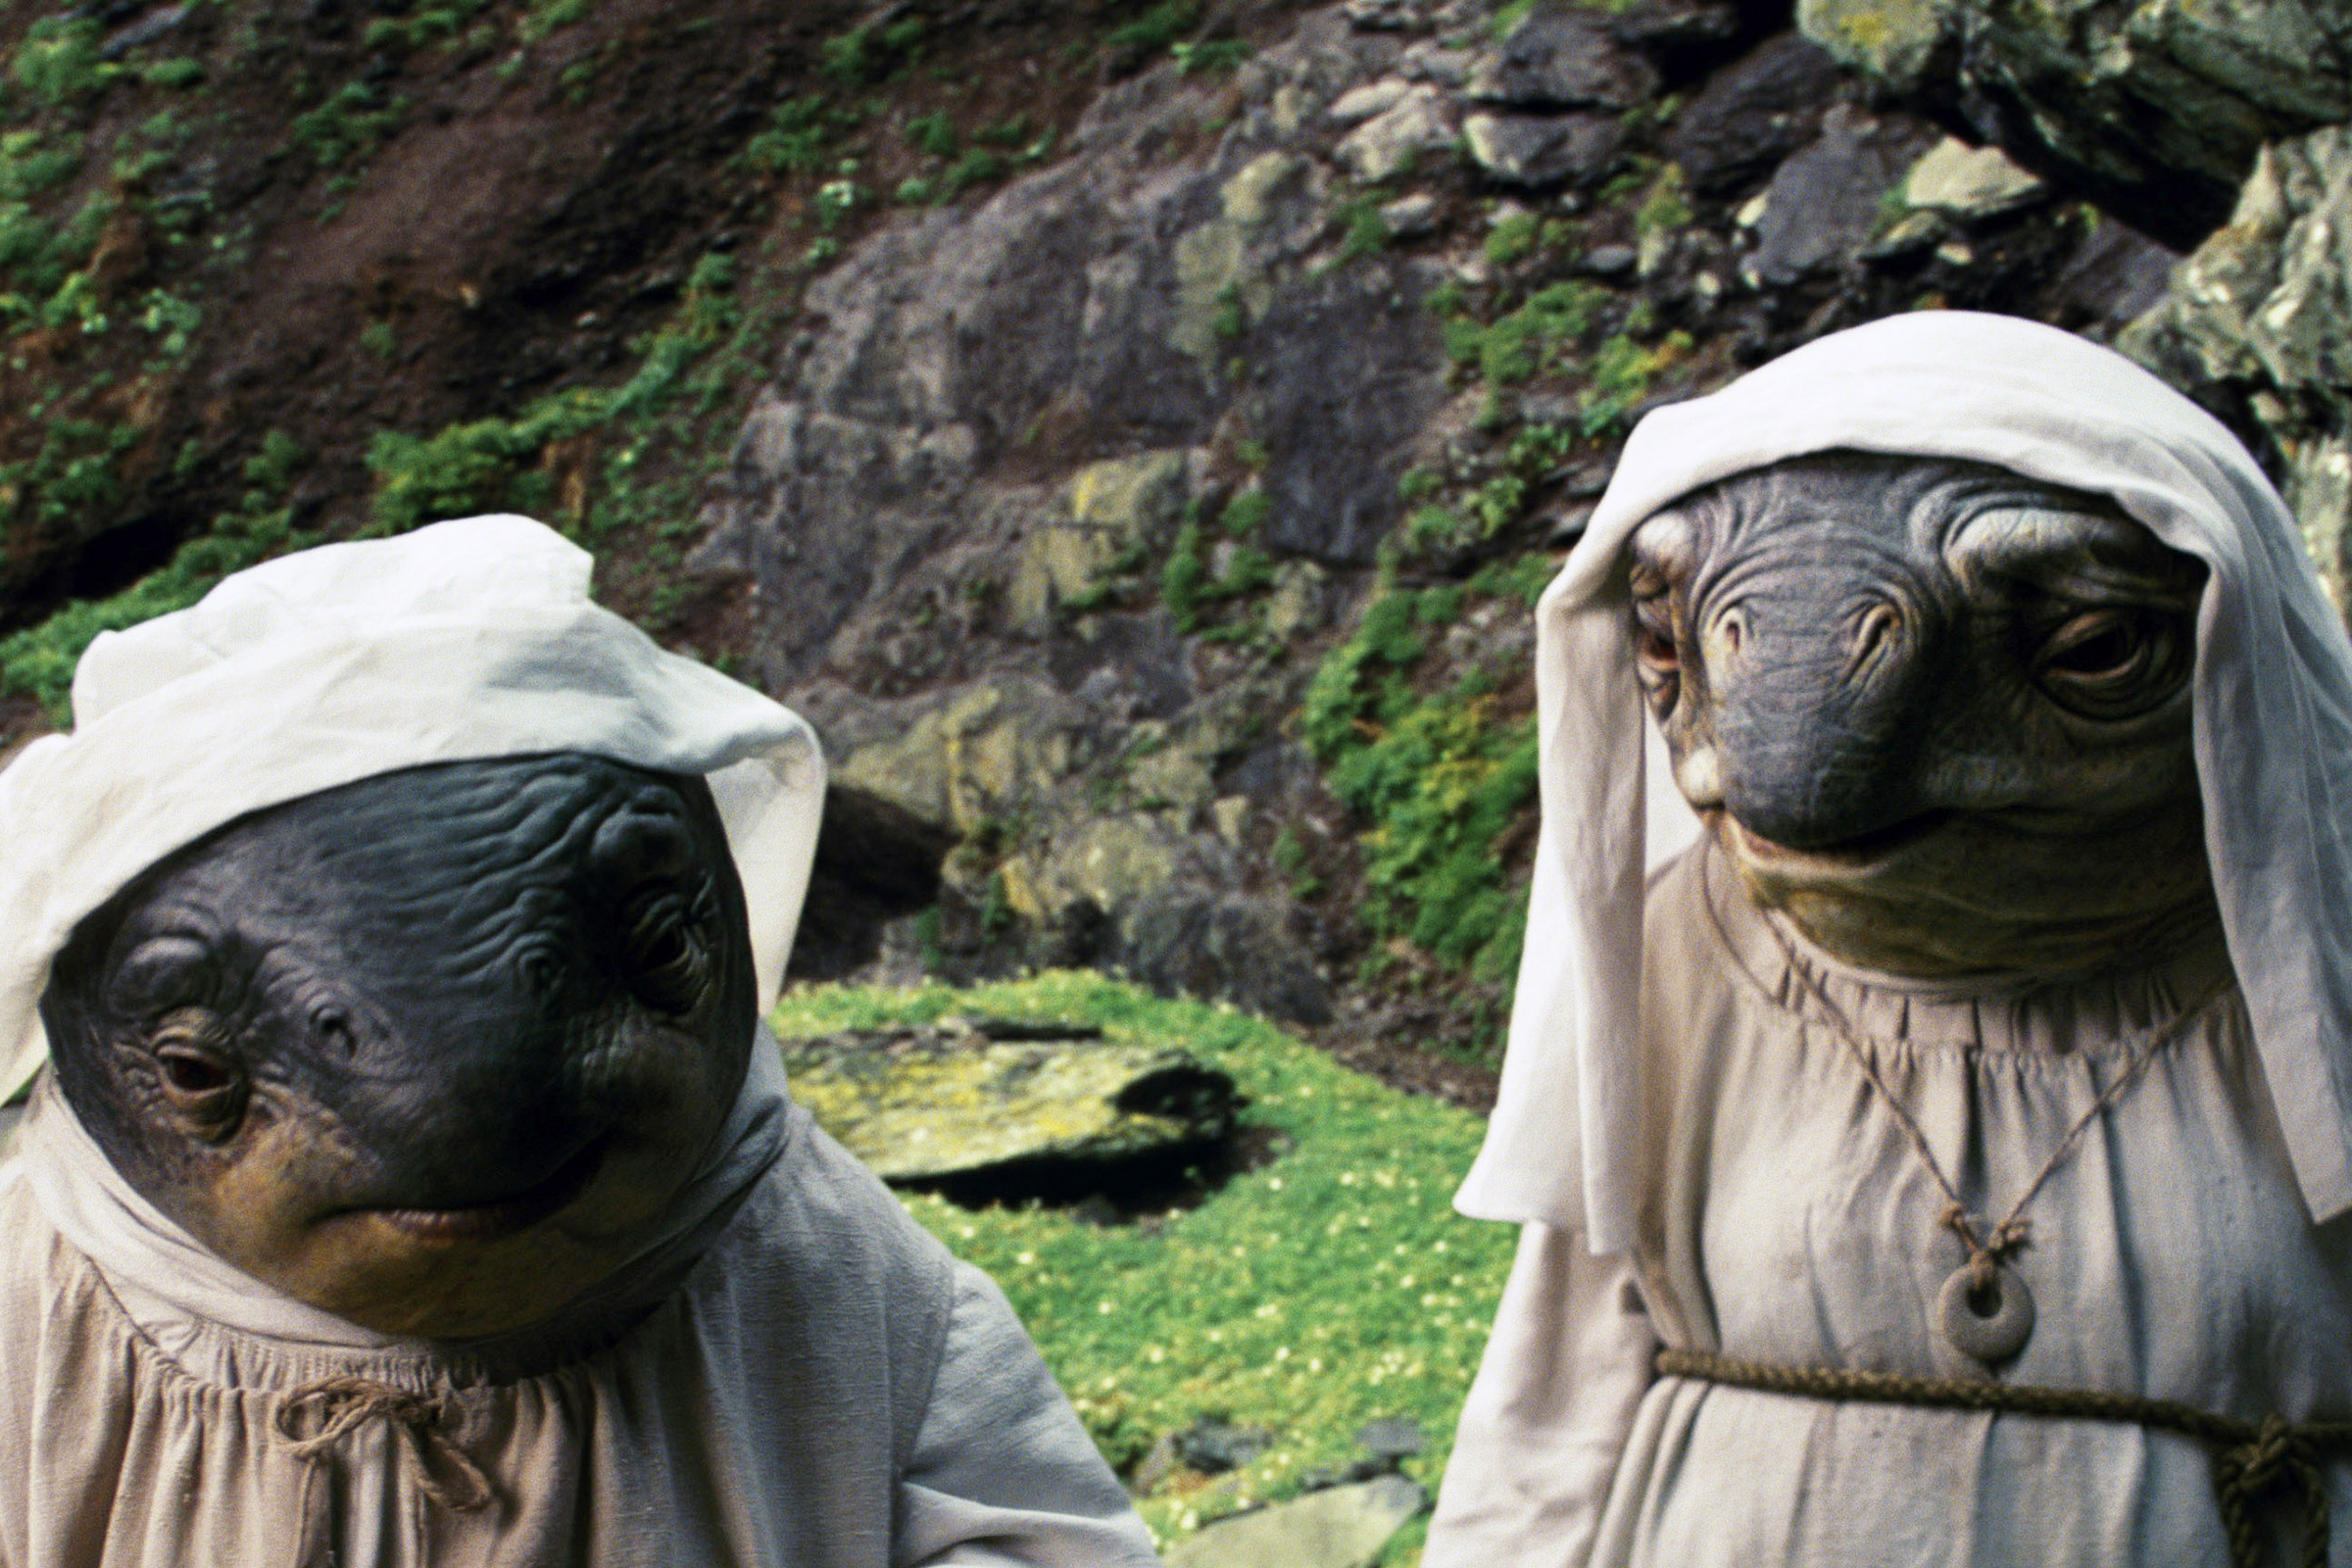 Caretakers in Star Wars: The Last Jedi